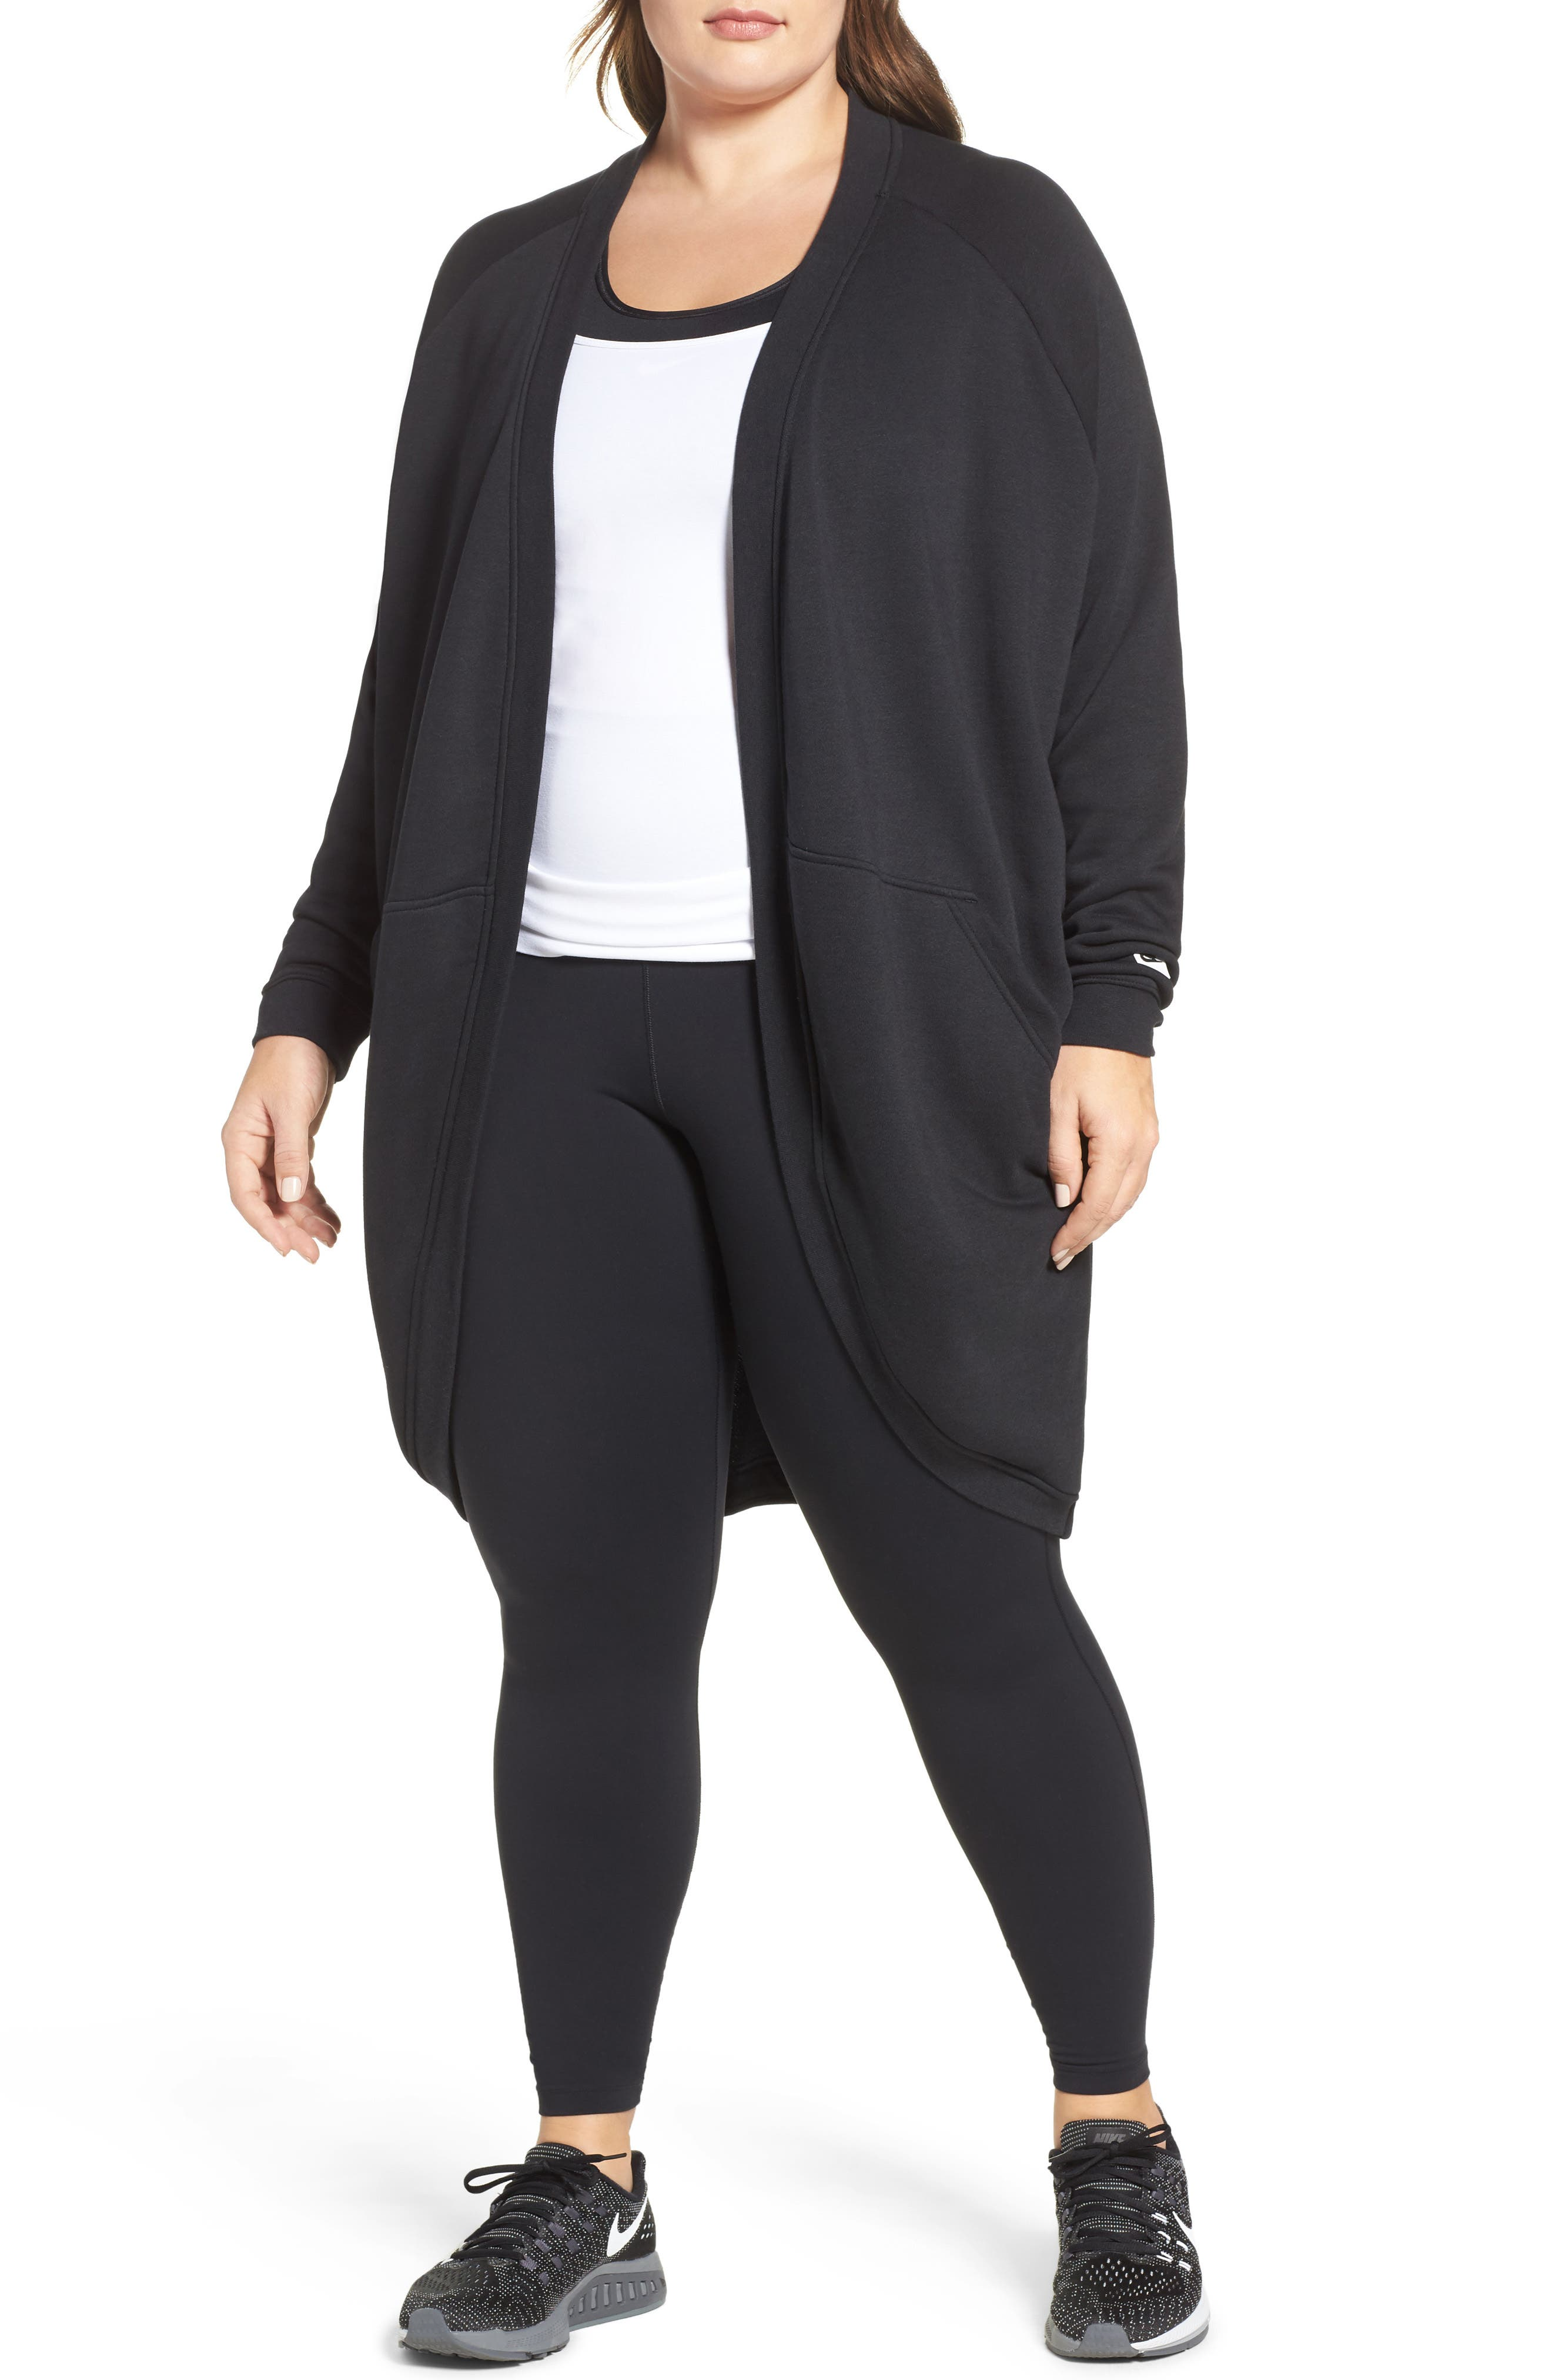 Sportswear Modern Cardigan,                             Main thumbnail 1, color,                             010